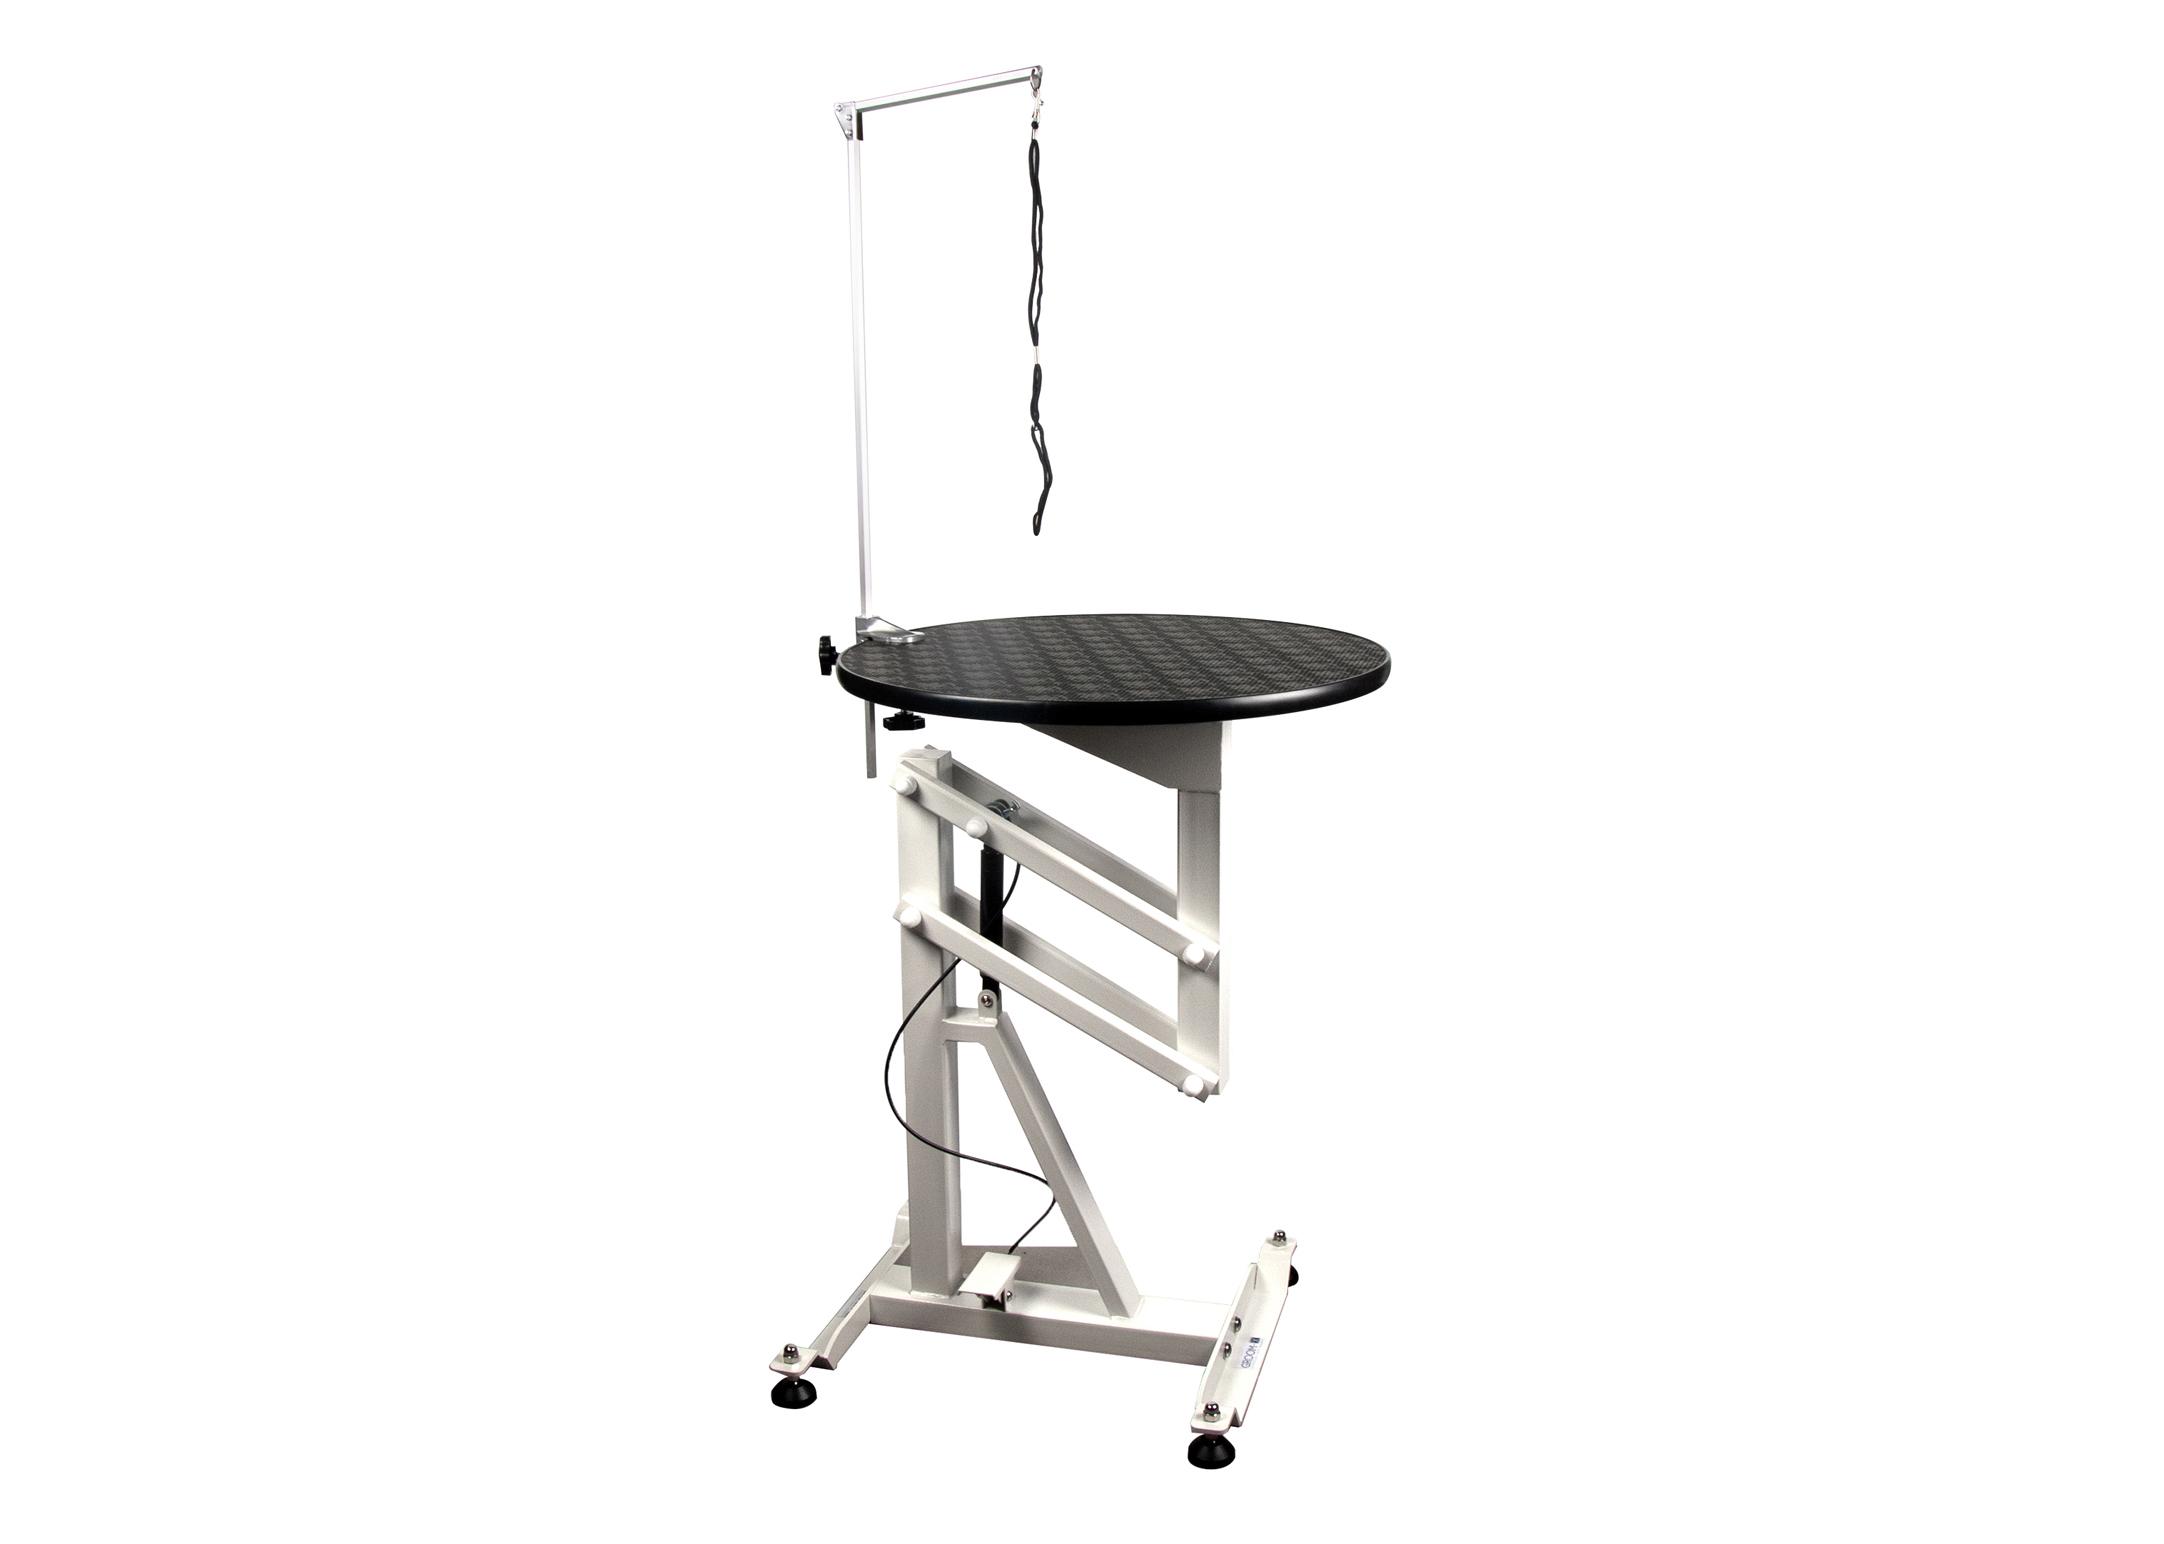 Groom-X Compact Air Lift Table de Toilettage Ronde Royal Lotus dia.60x80-120cmh avec Potence